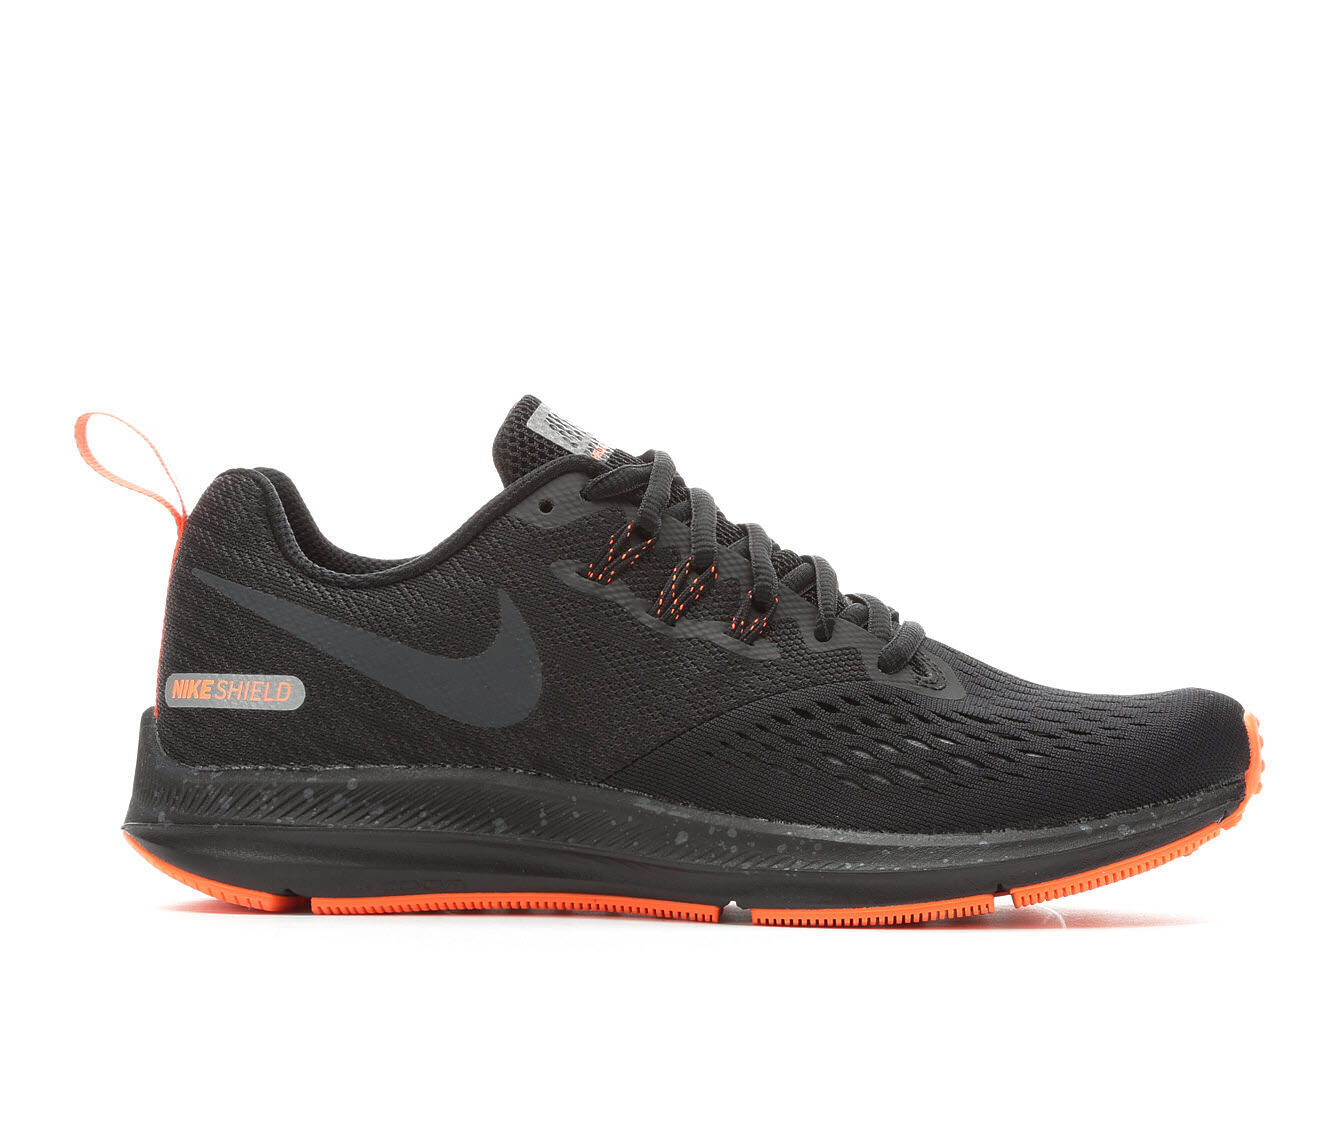 Women's Nike Zoom Winflo 4 Shield Running Shoes outlet 100% guaranteed IjQs8t6